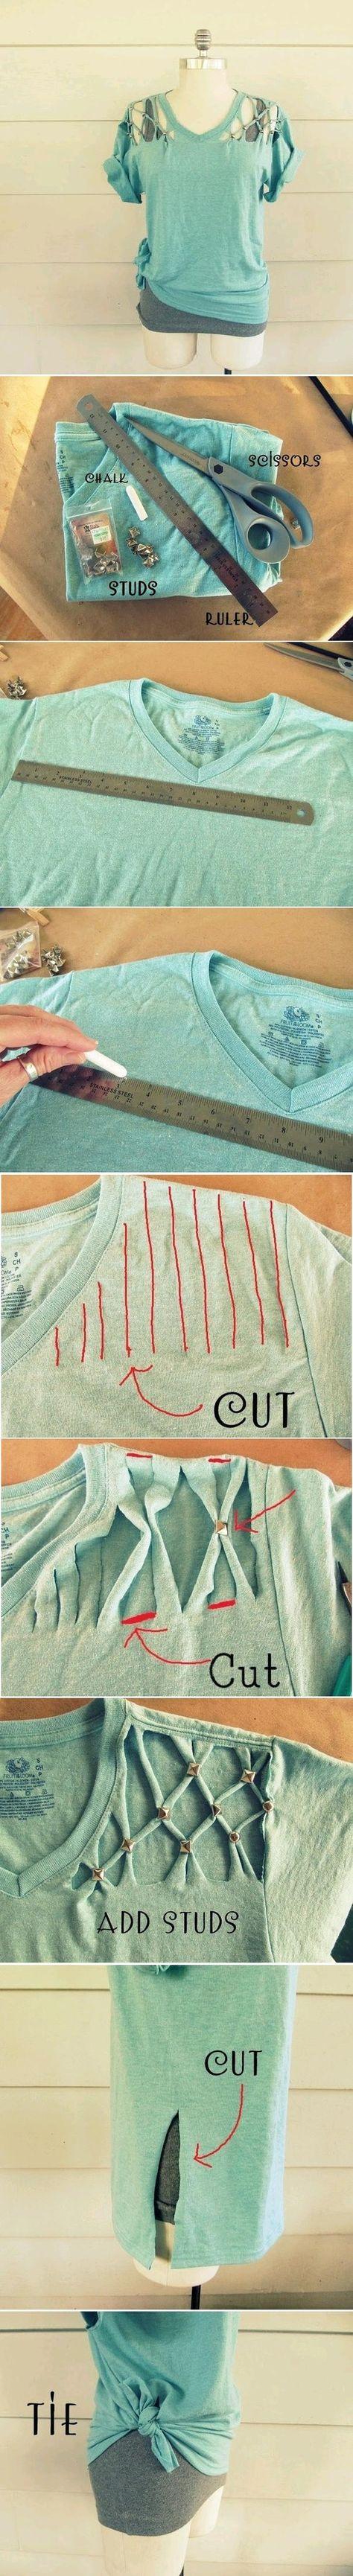 DIY Cool Studded T-Shirt @Jacqueline